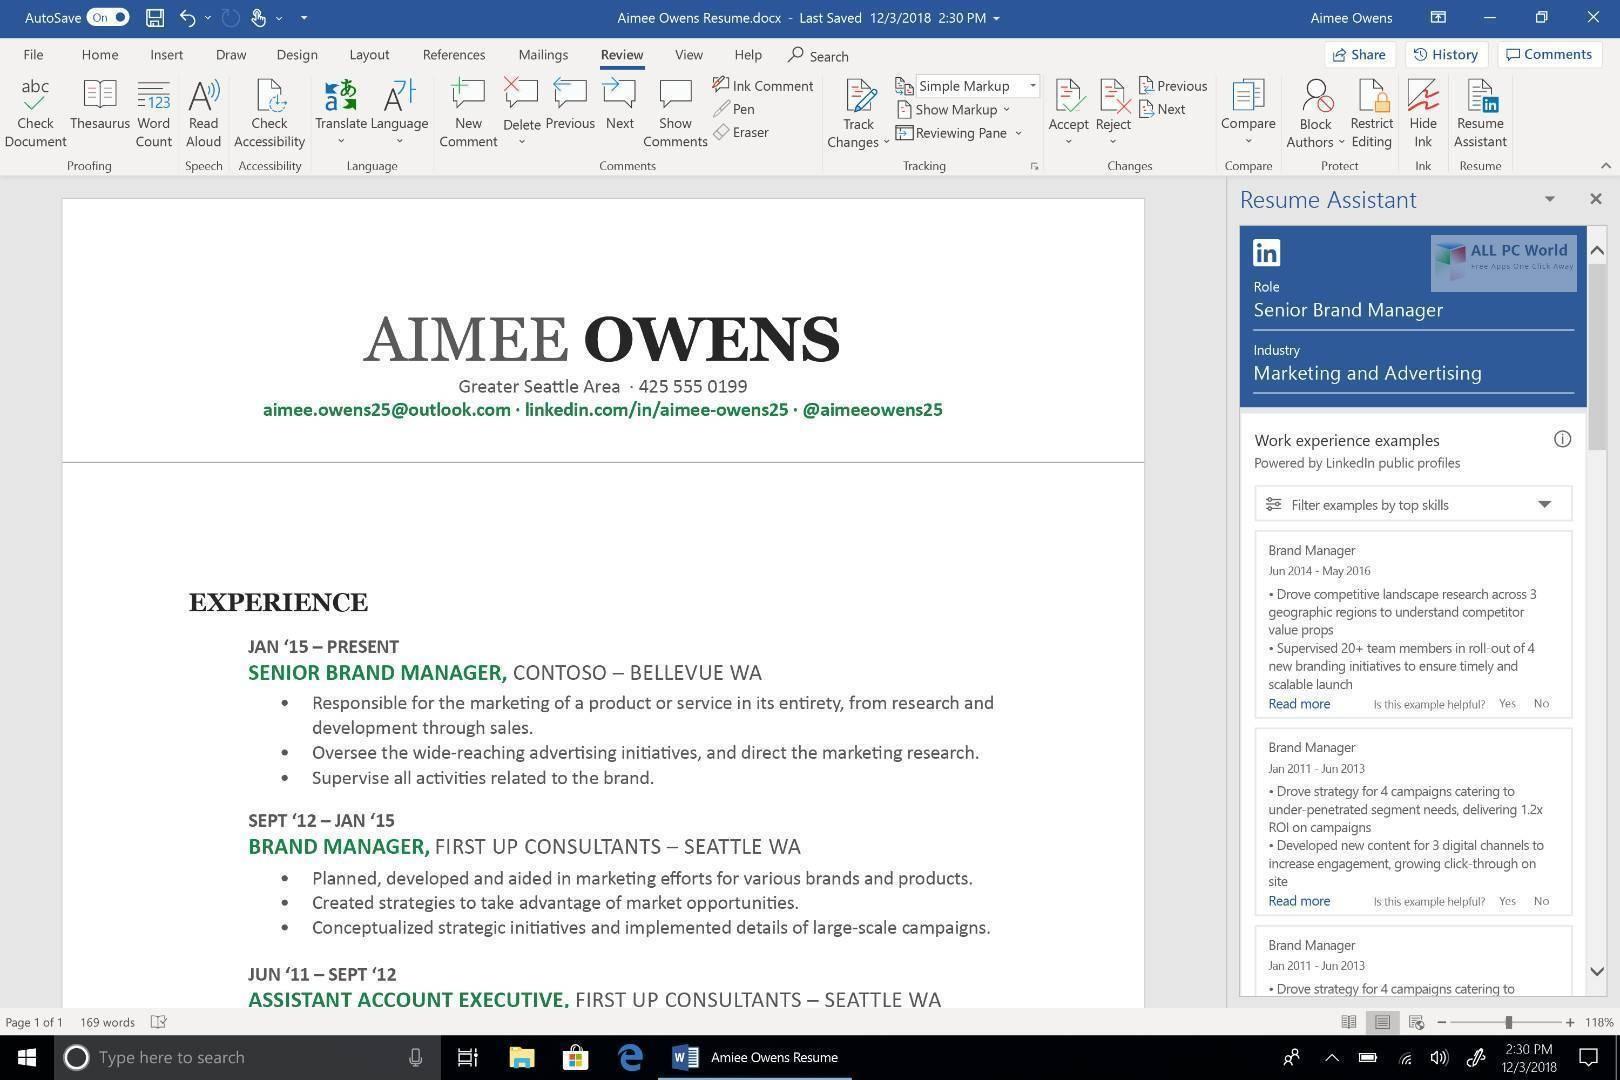 Microsoft Office 2019 Pro Plus VL v2002 Free Download